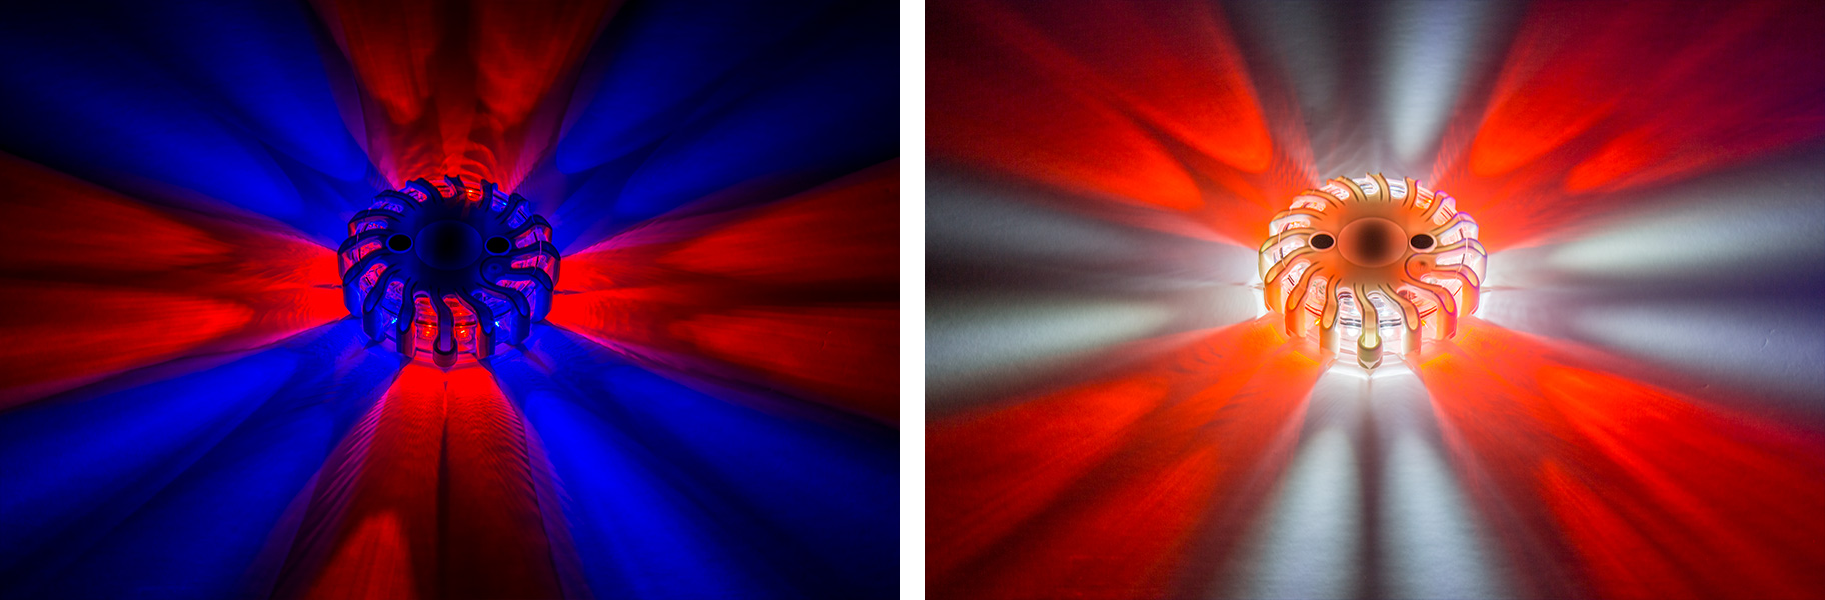 LED road flares - dual-color lights